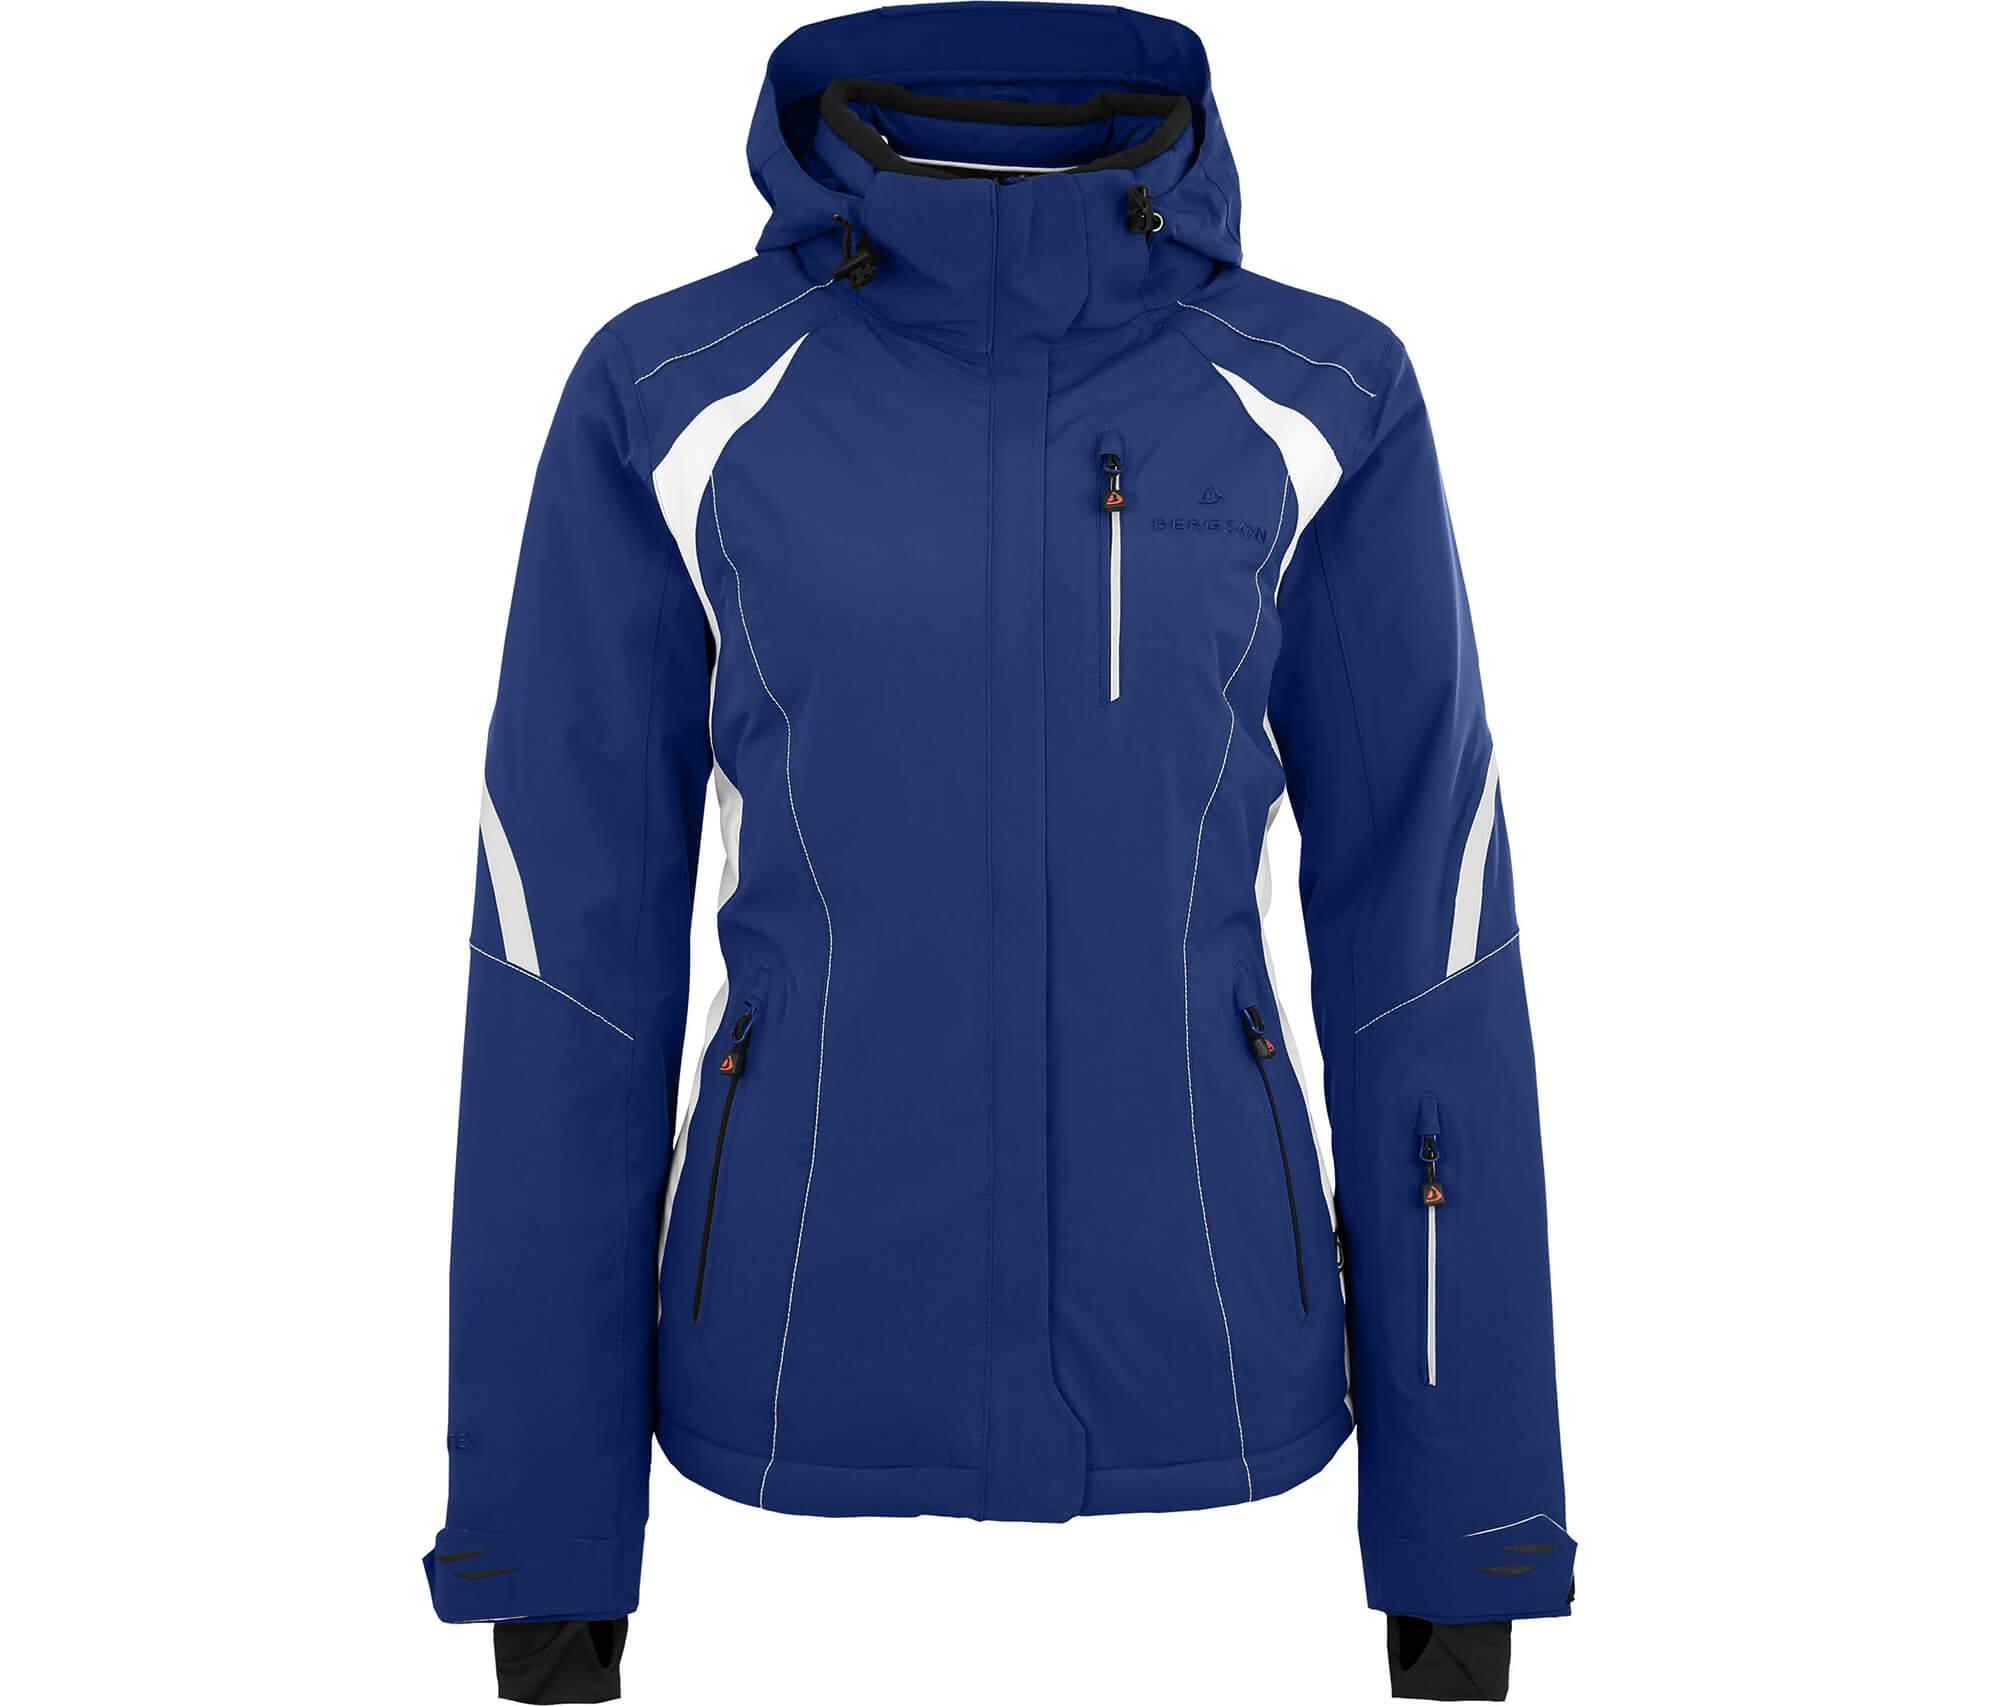 Damen Bergson Damen Snowtastic Bergson Skijacke Bergson Damen Snowtastic Blau Skijacke Blau N80wPZknOX